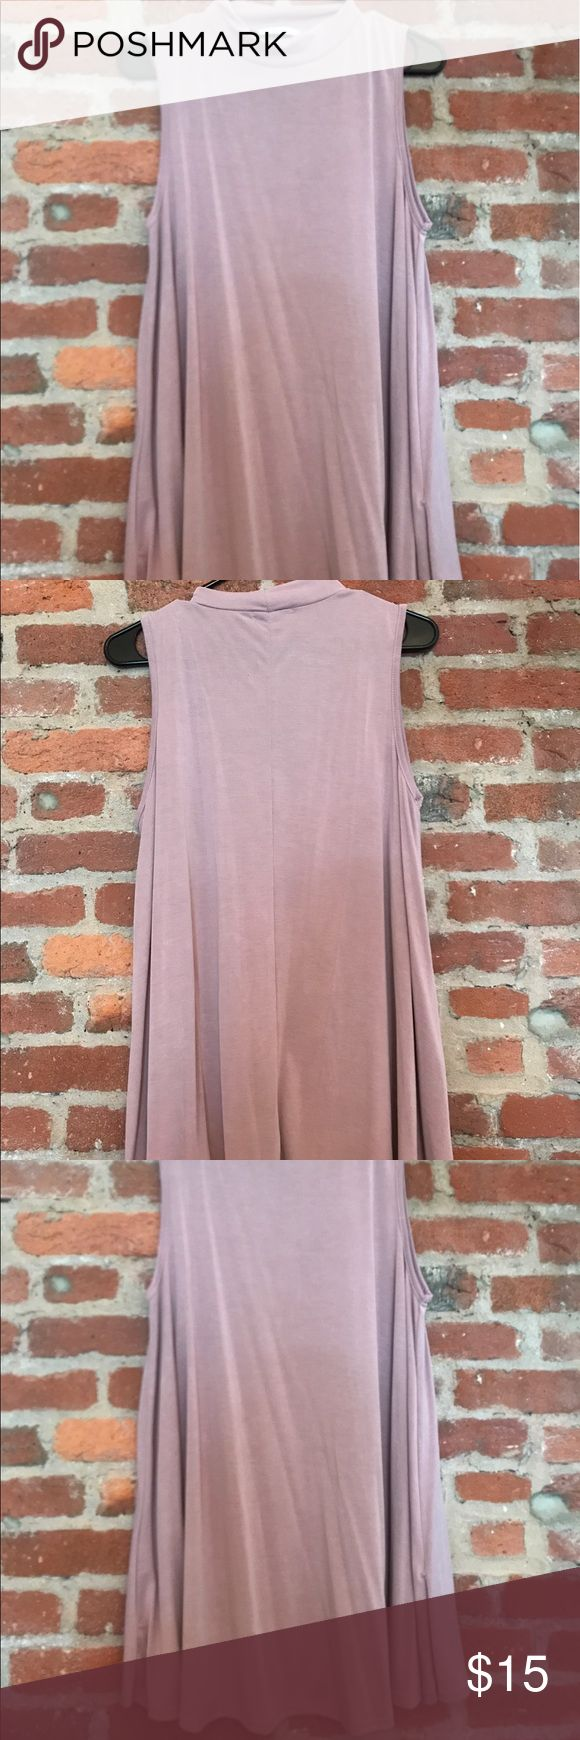 Purple mini dress Purple mini dress Dresses Mini